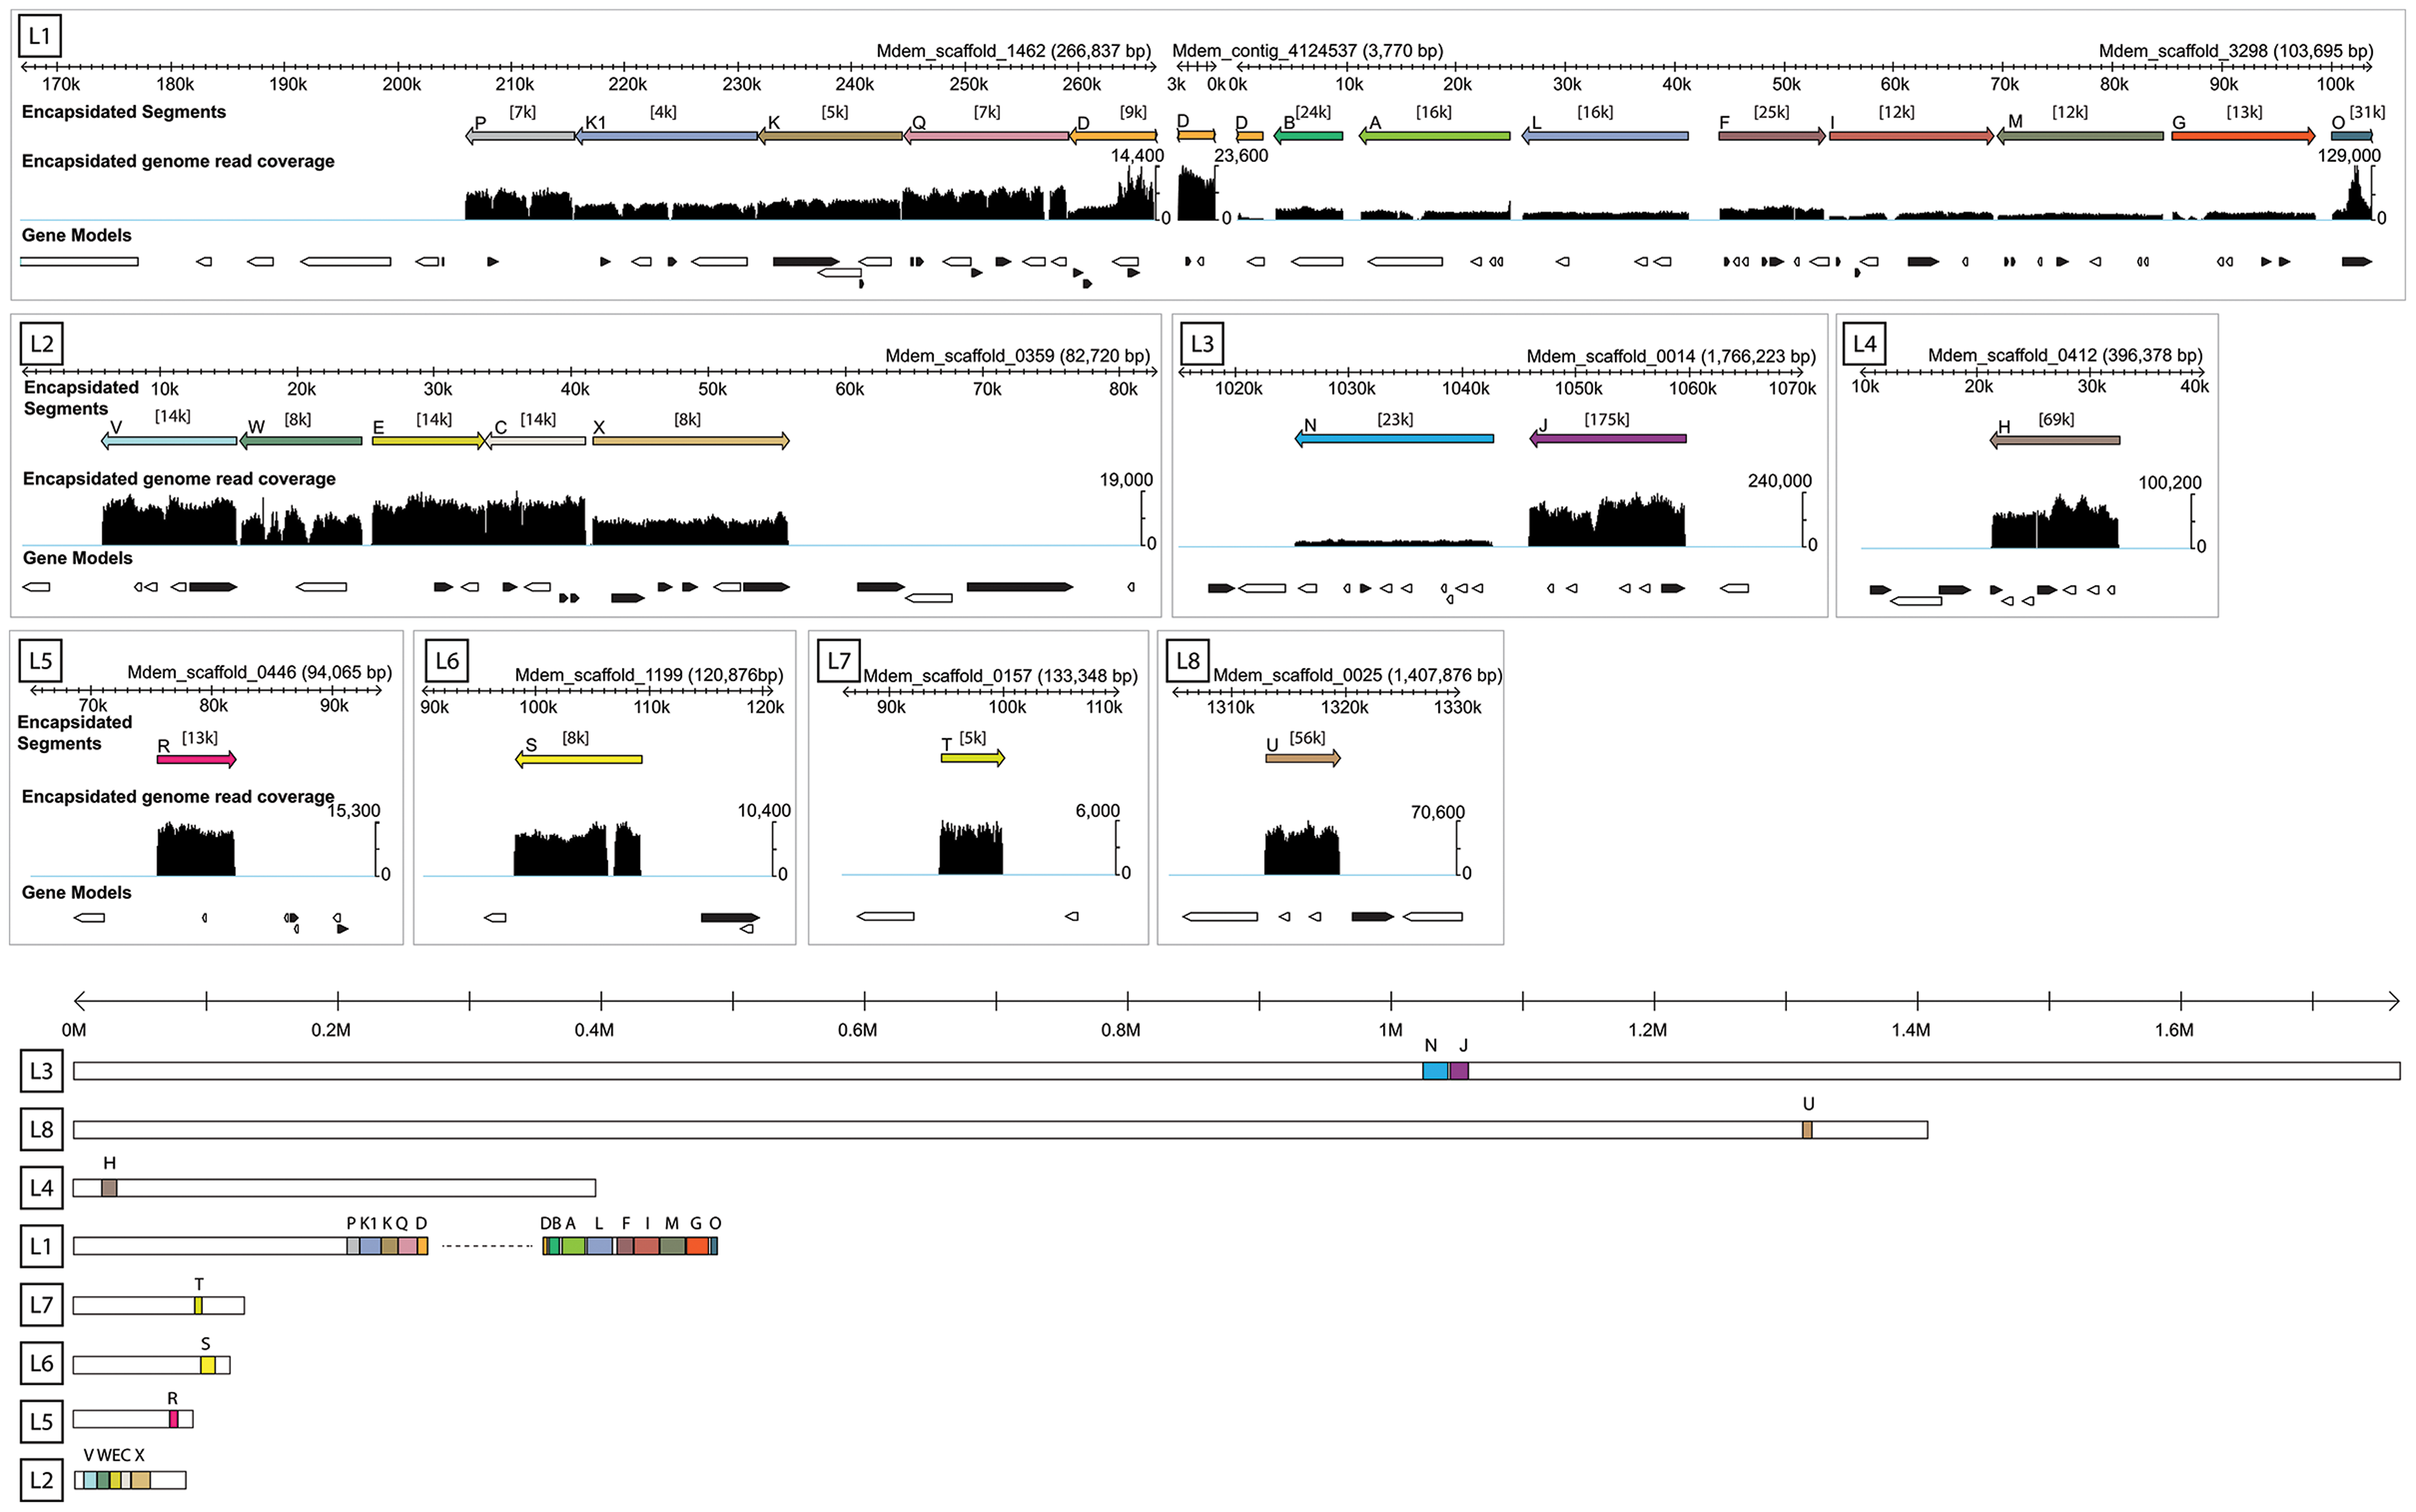 Genomic organization of MdBV proviral segment loci.